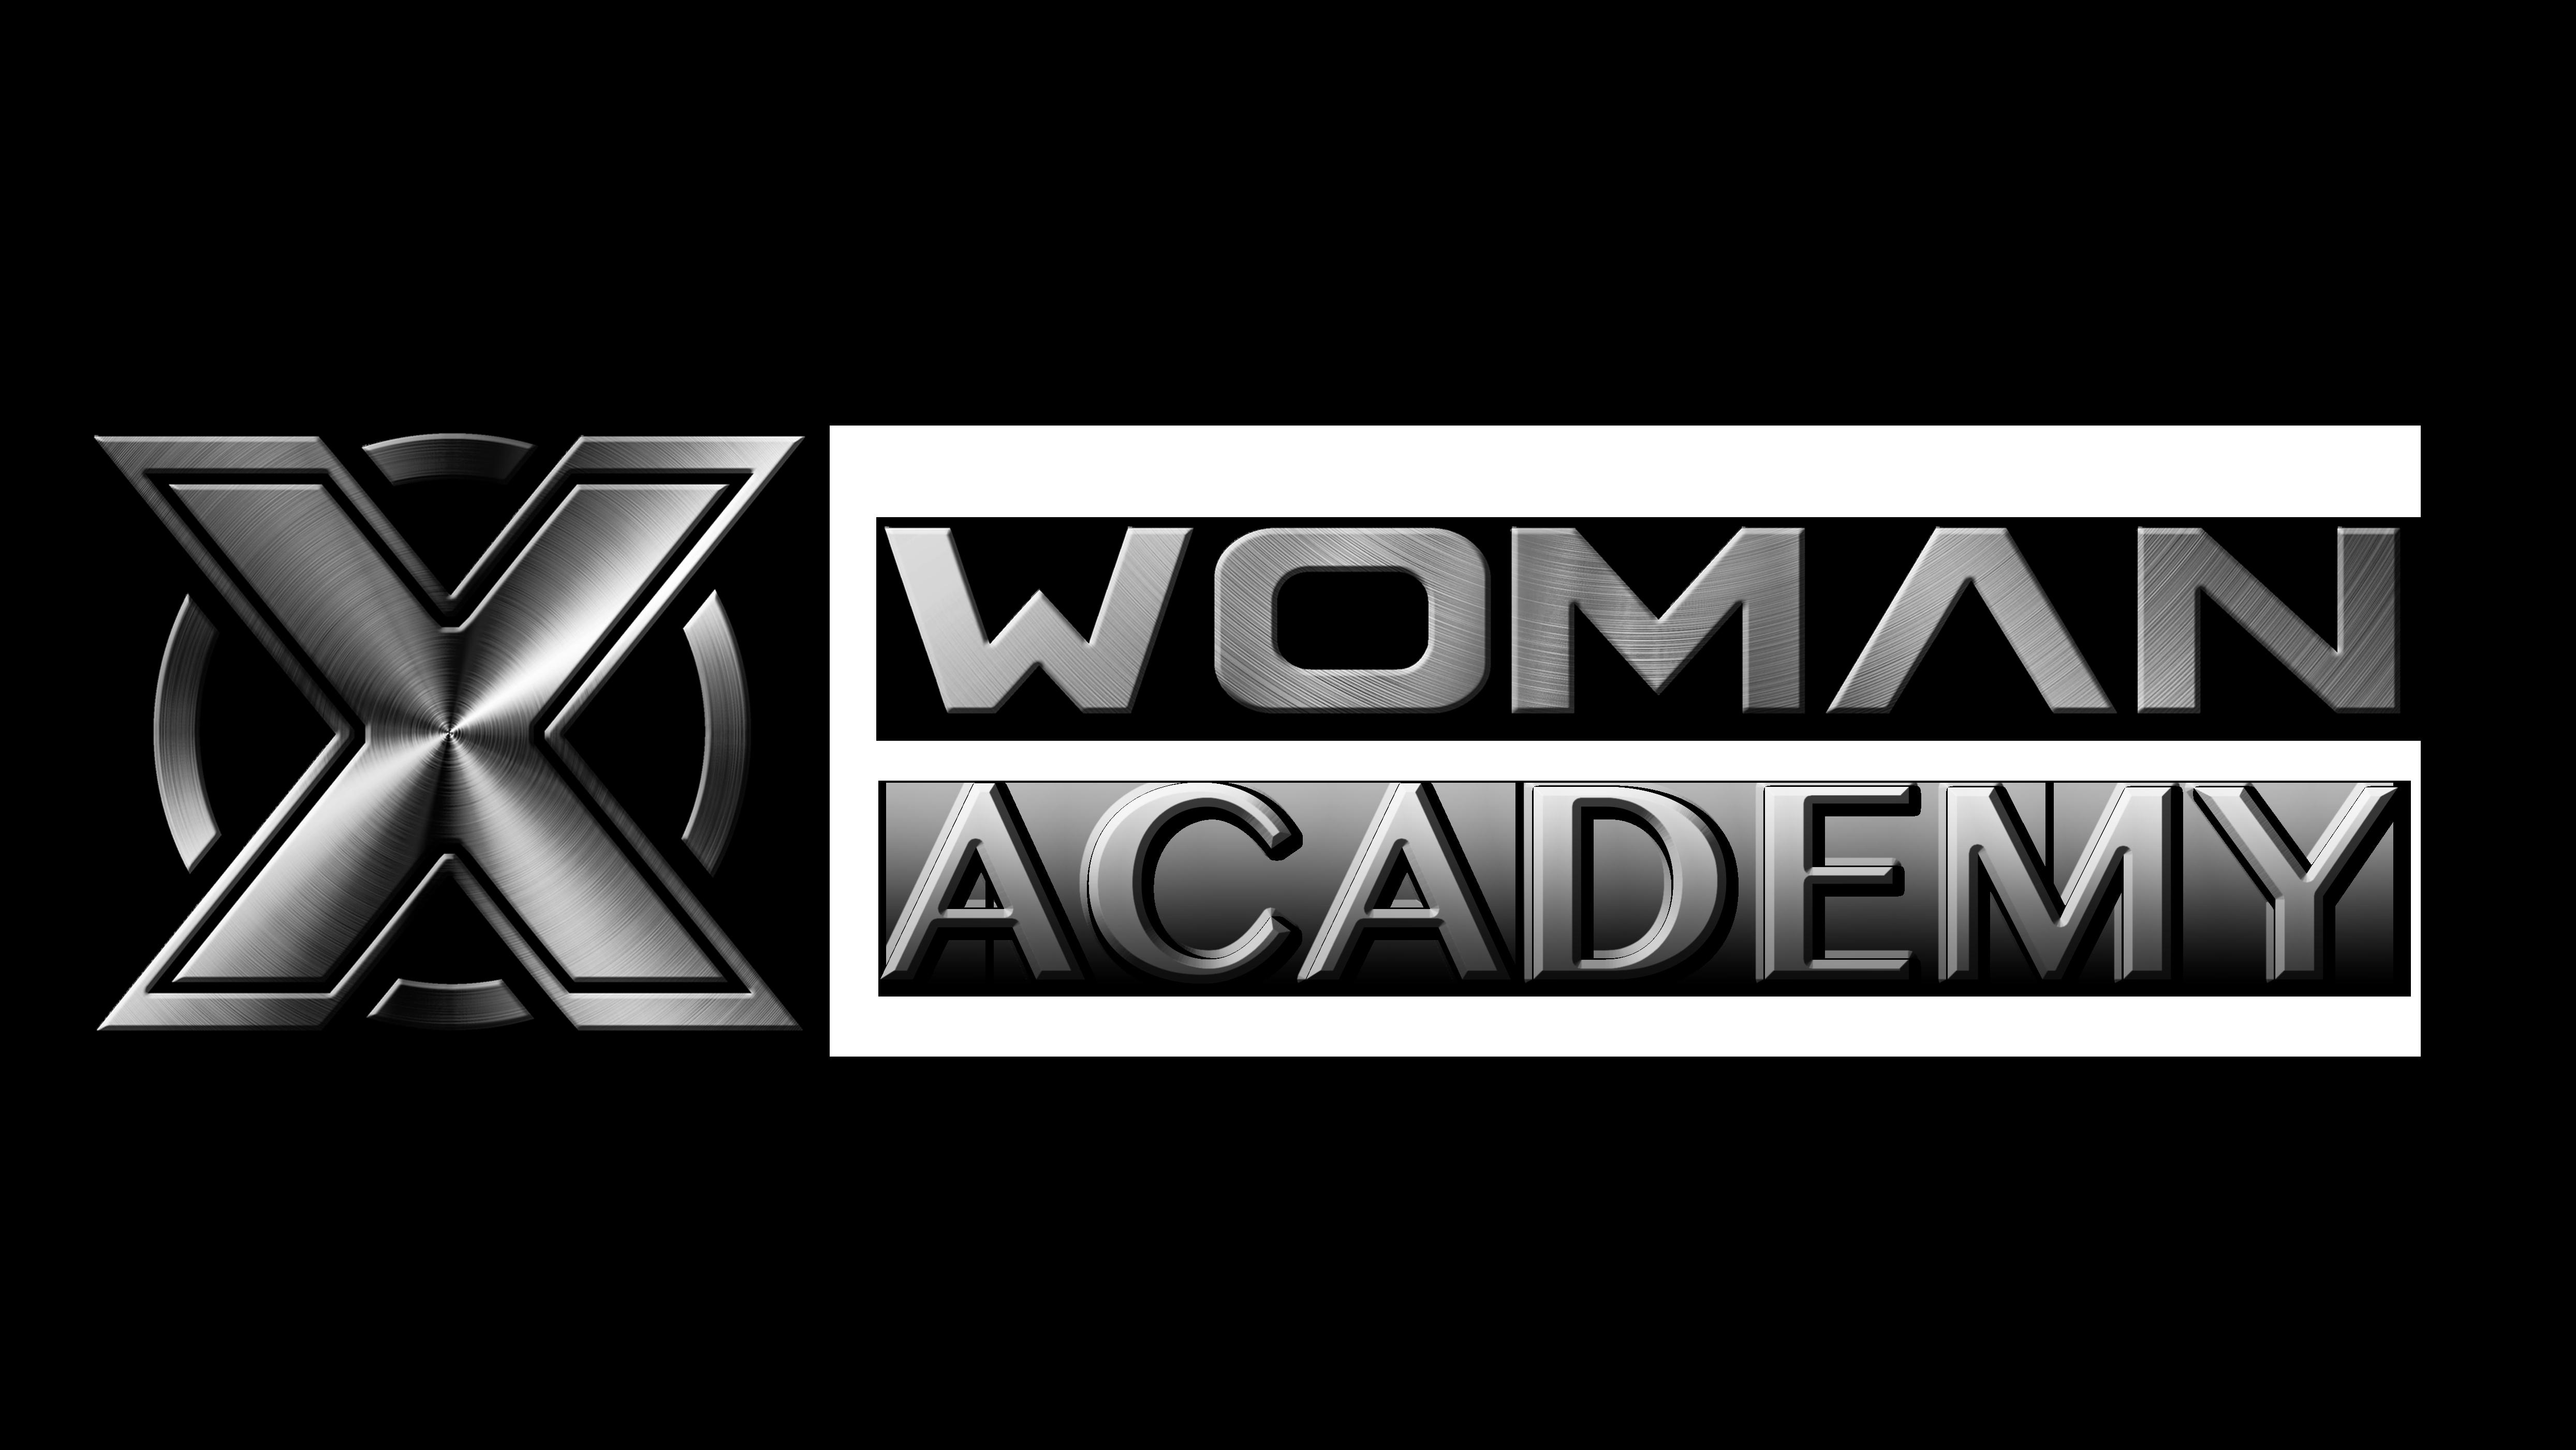 Accademia X WOMAN